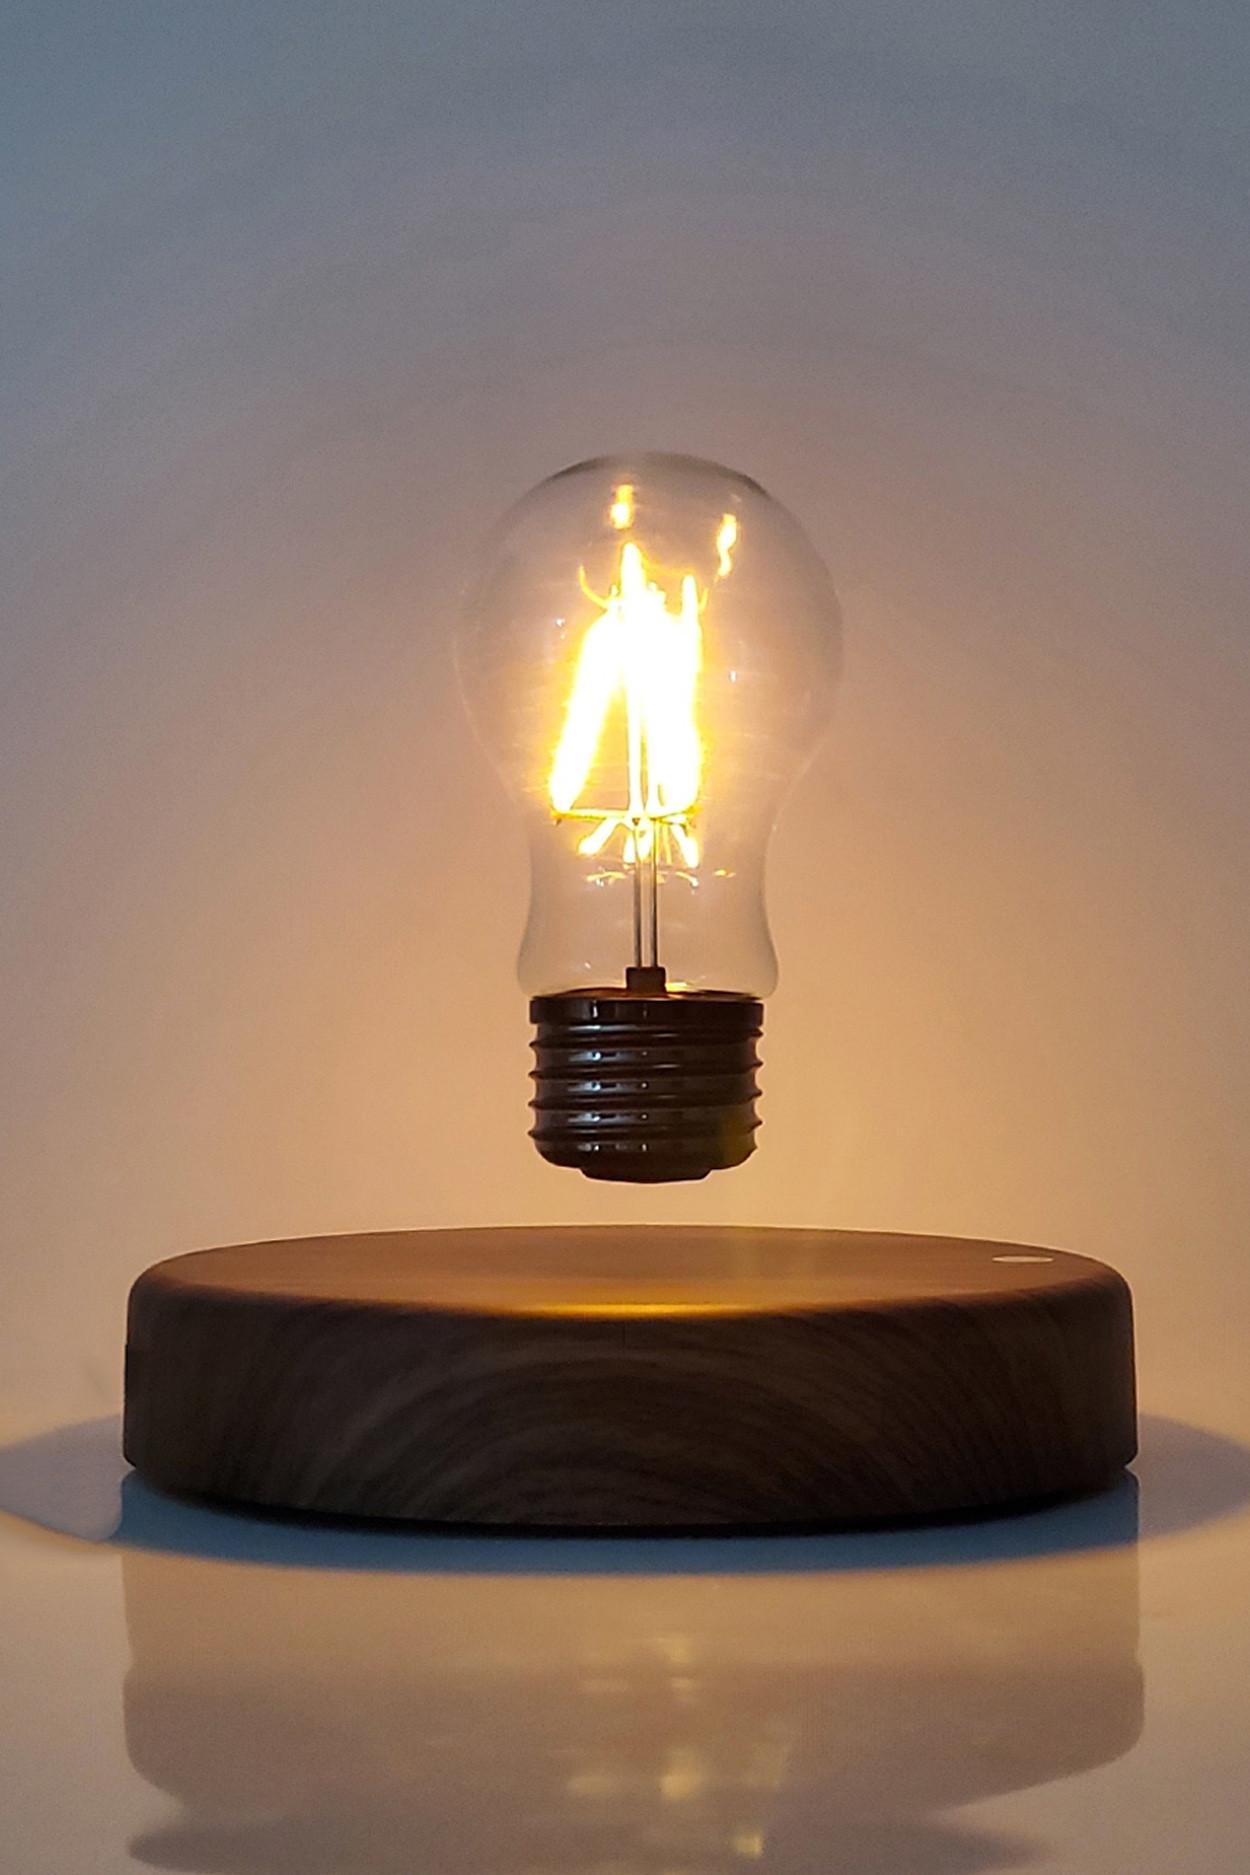 Левитирующая лампочка на круглой платформе